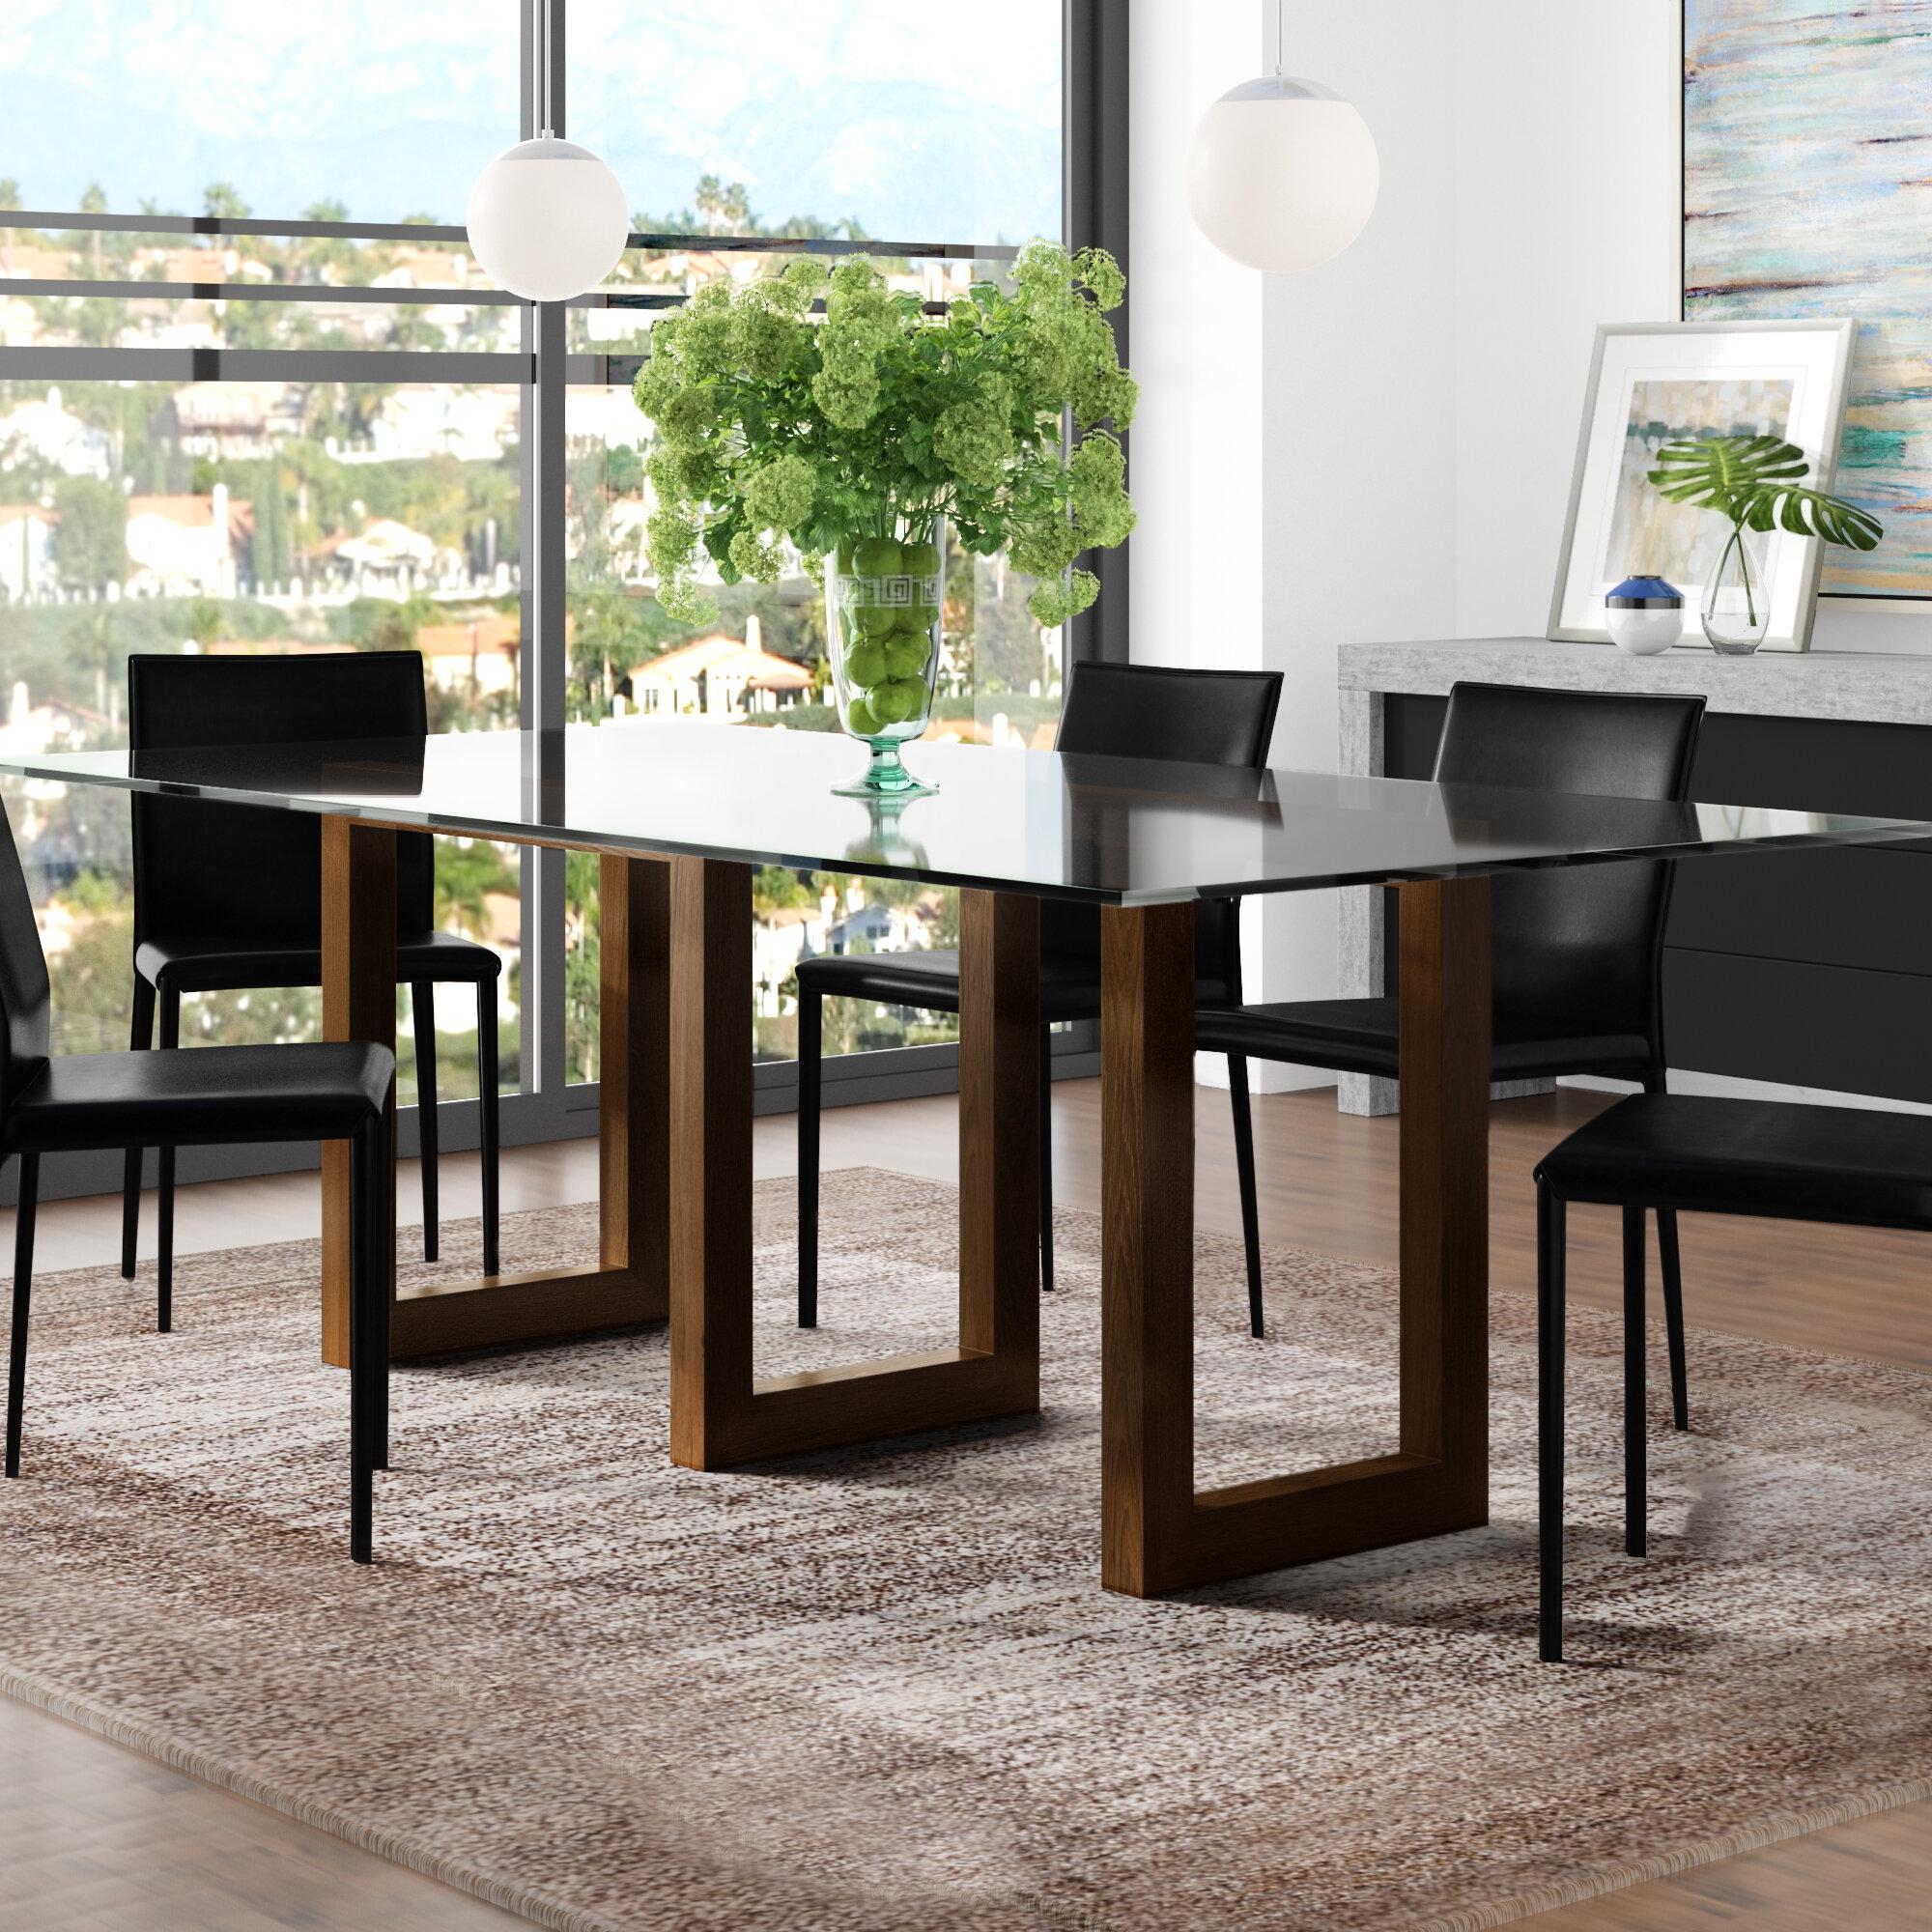 Orren Ellis Reesa Glass Solid Wood Dining Table  8112f4b9f888